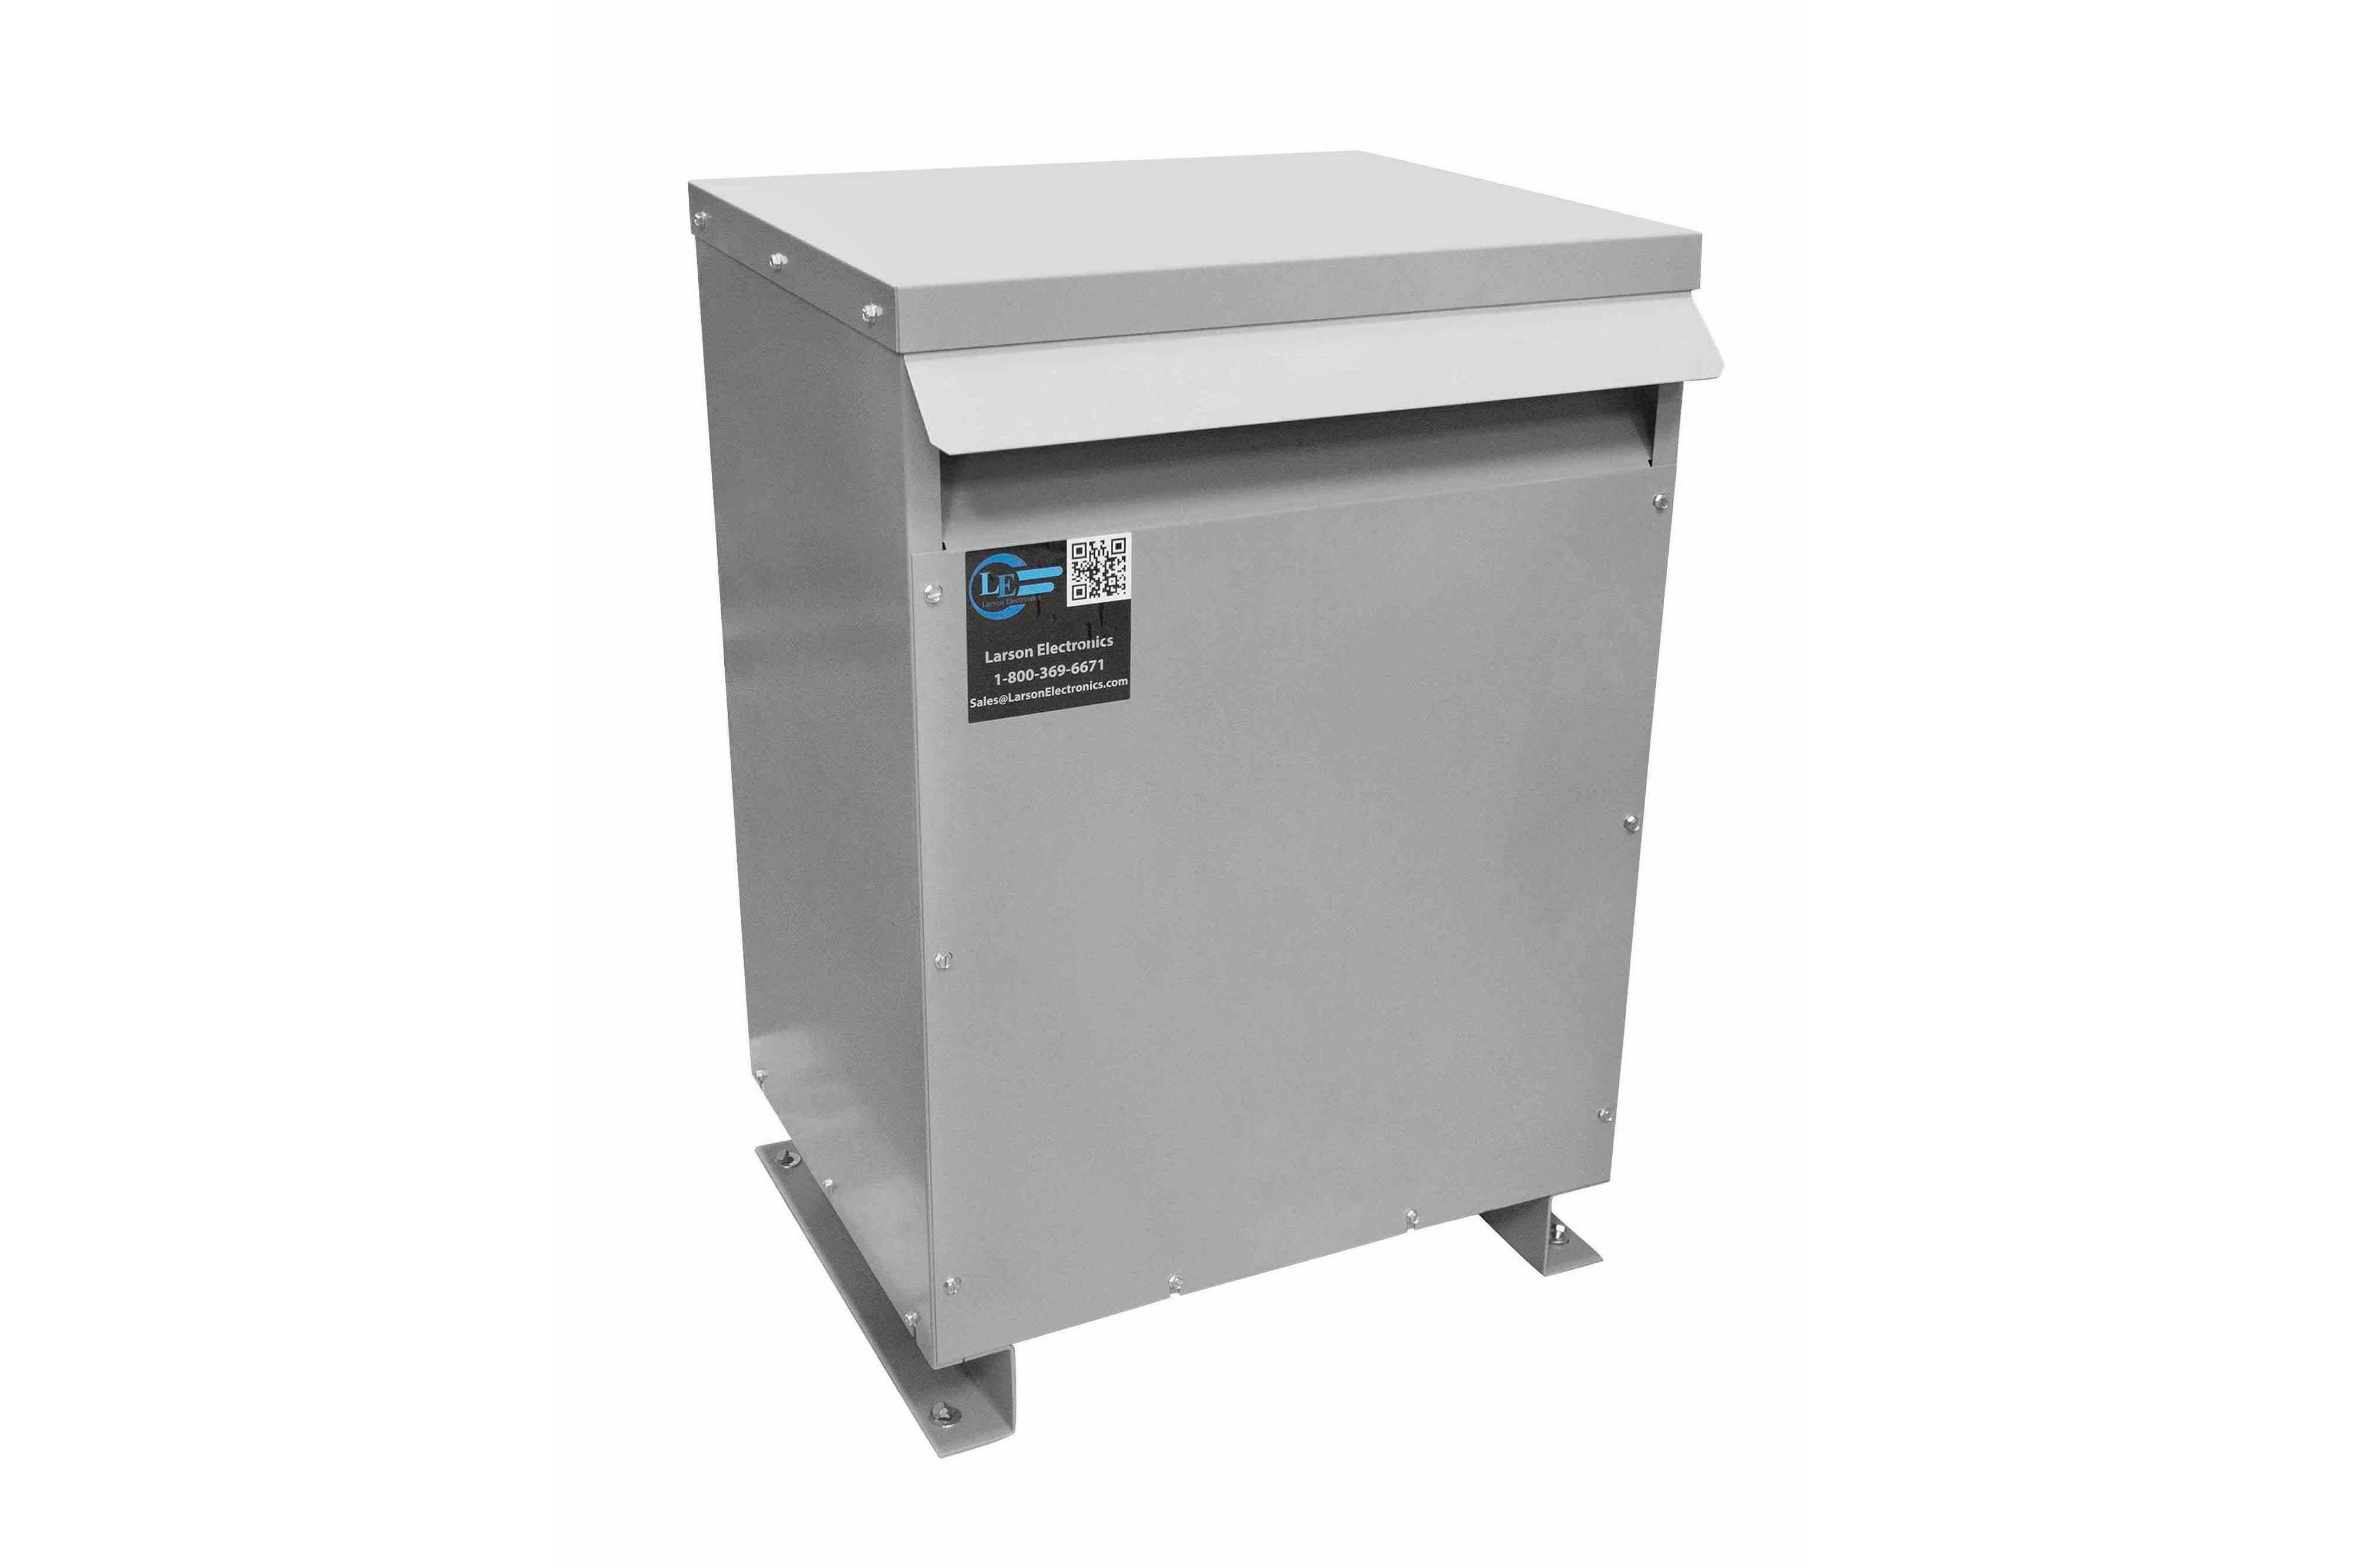 11 kVA 3PH Isolation Transformer, 230V Wye Primary, 208V Delta Secondary, N3R, Ventilated, 60 Hz